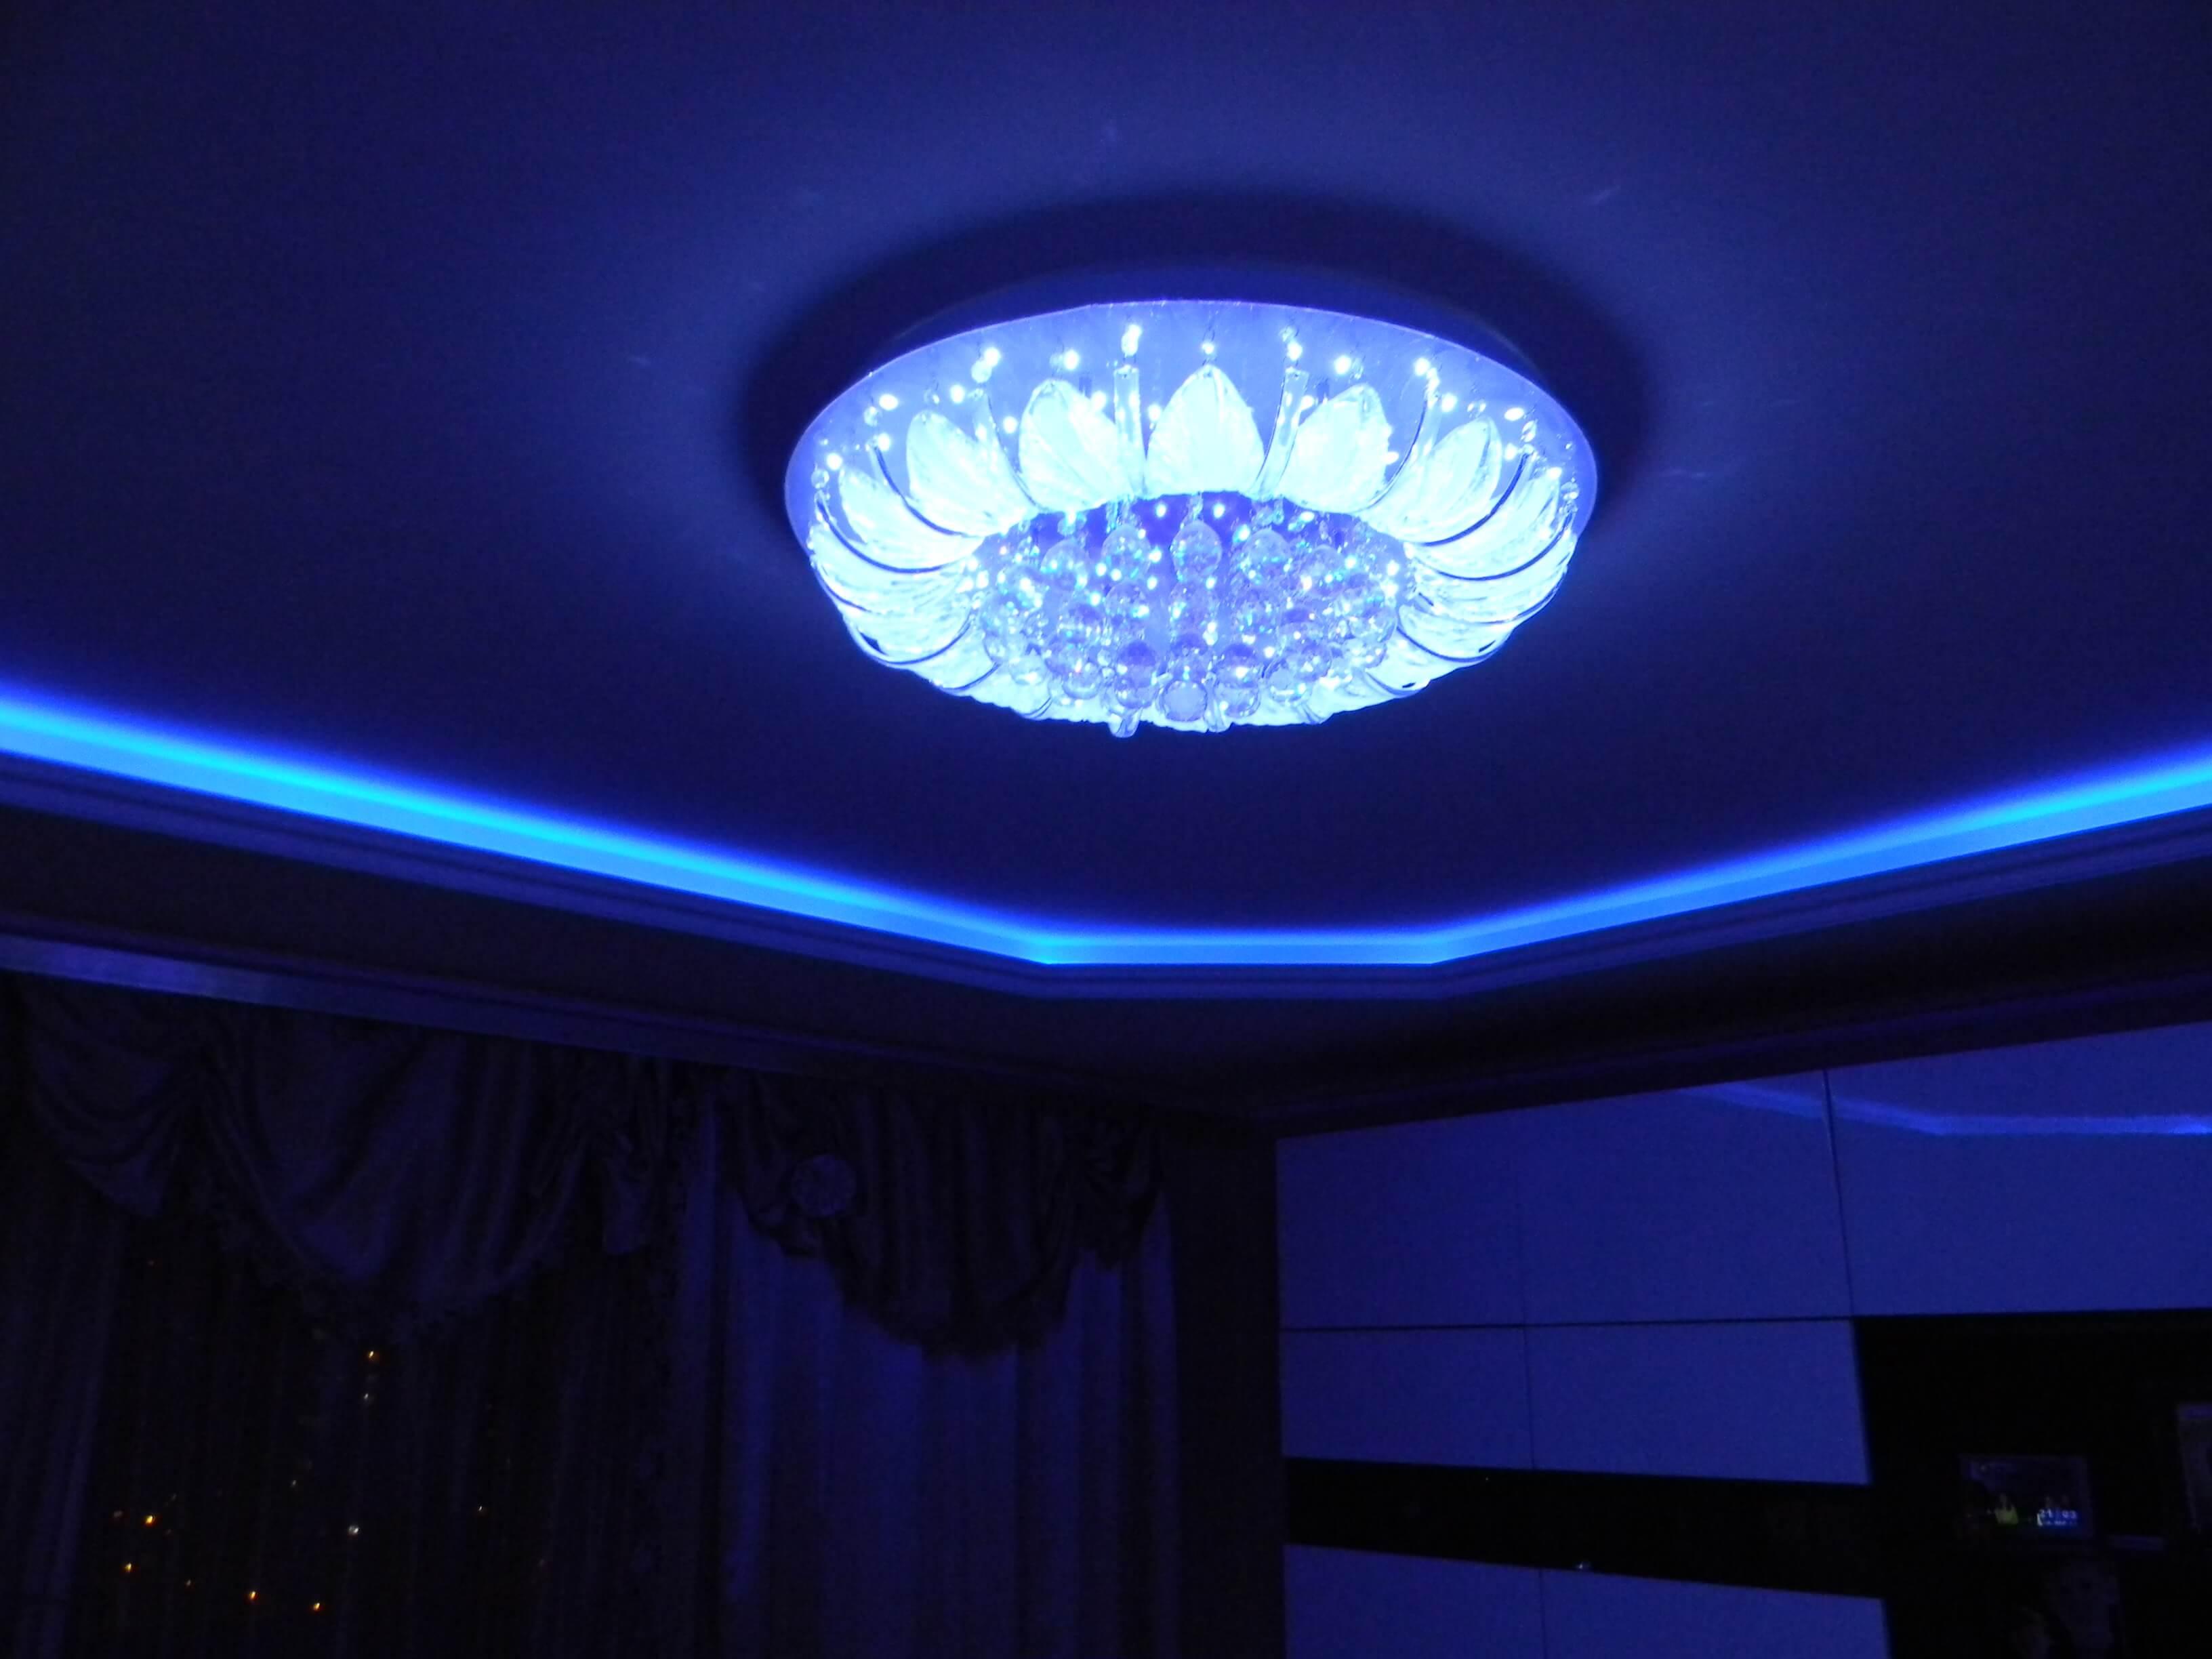 montage fixation plafond kvartal aix en provence maison ikkoku lampe etoiles plafond. Black Bedroom Furniture Sets. Home Design Ideas